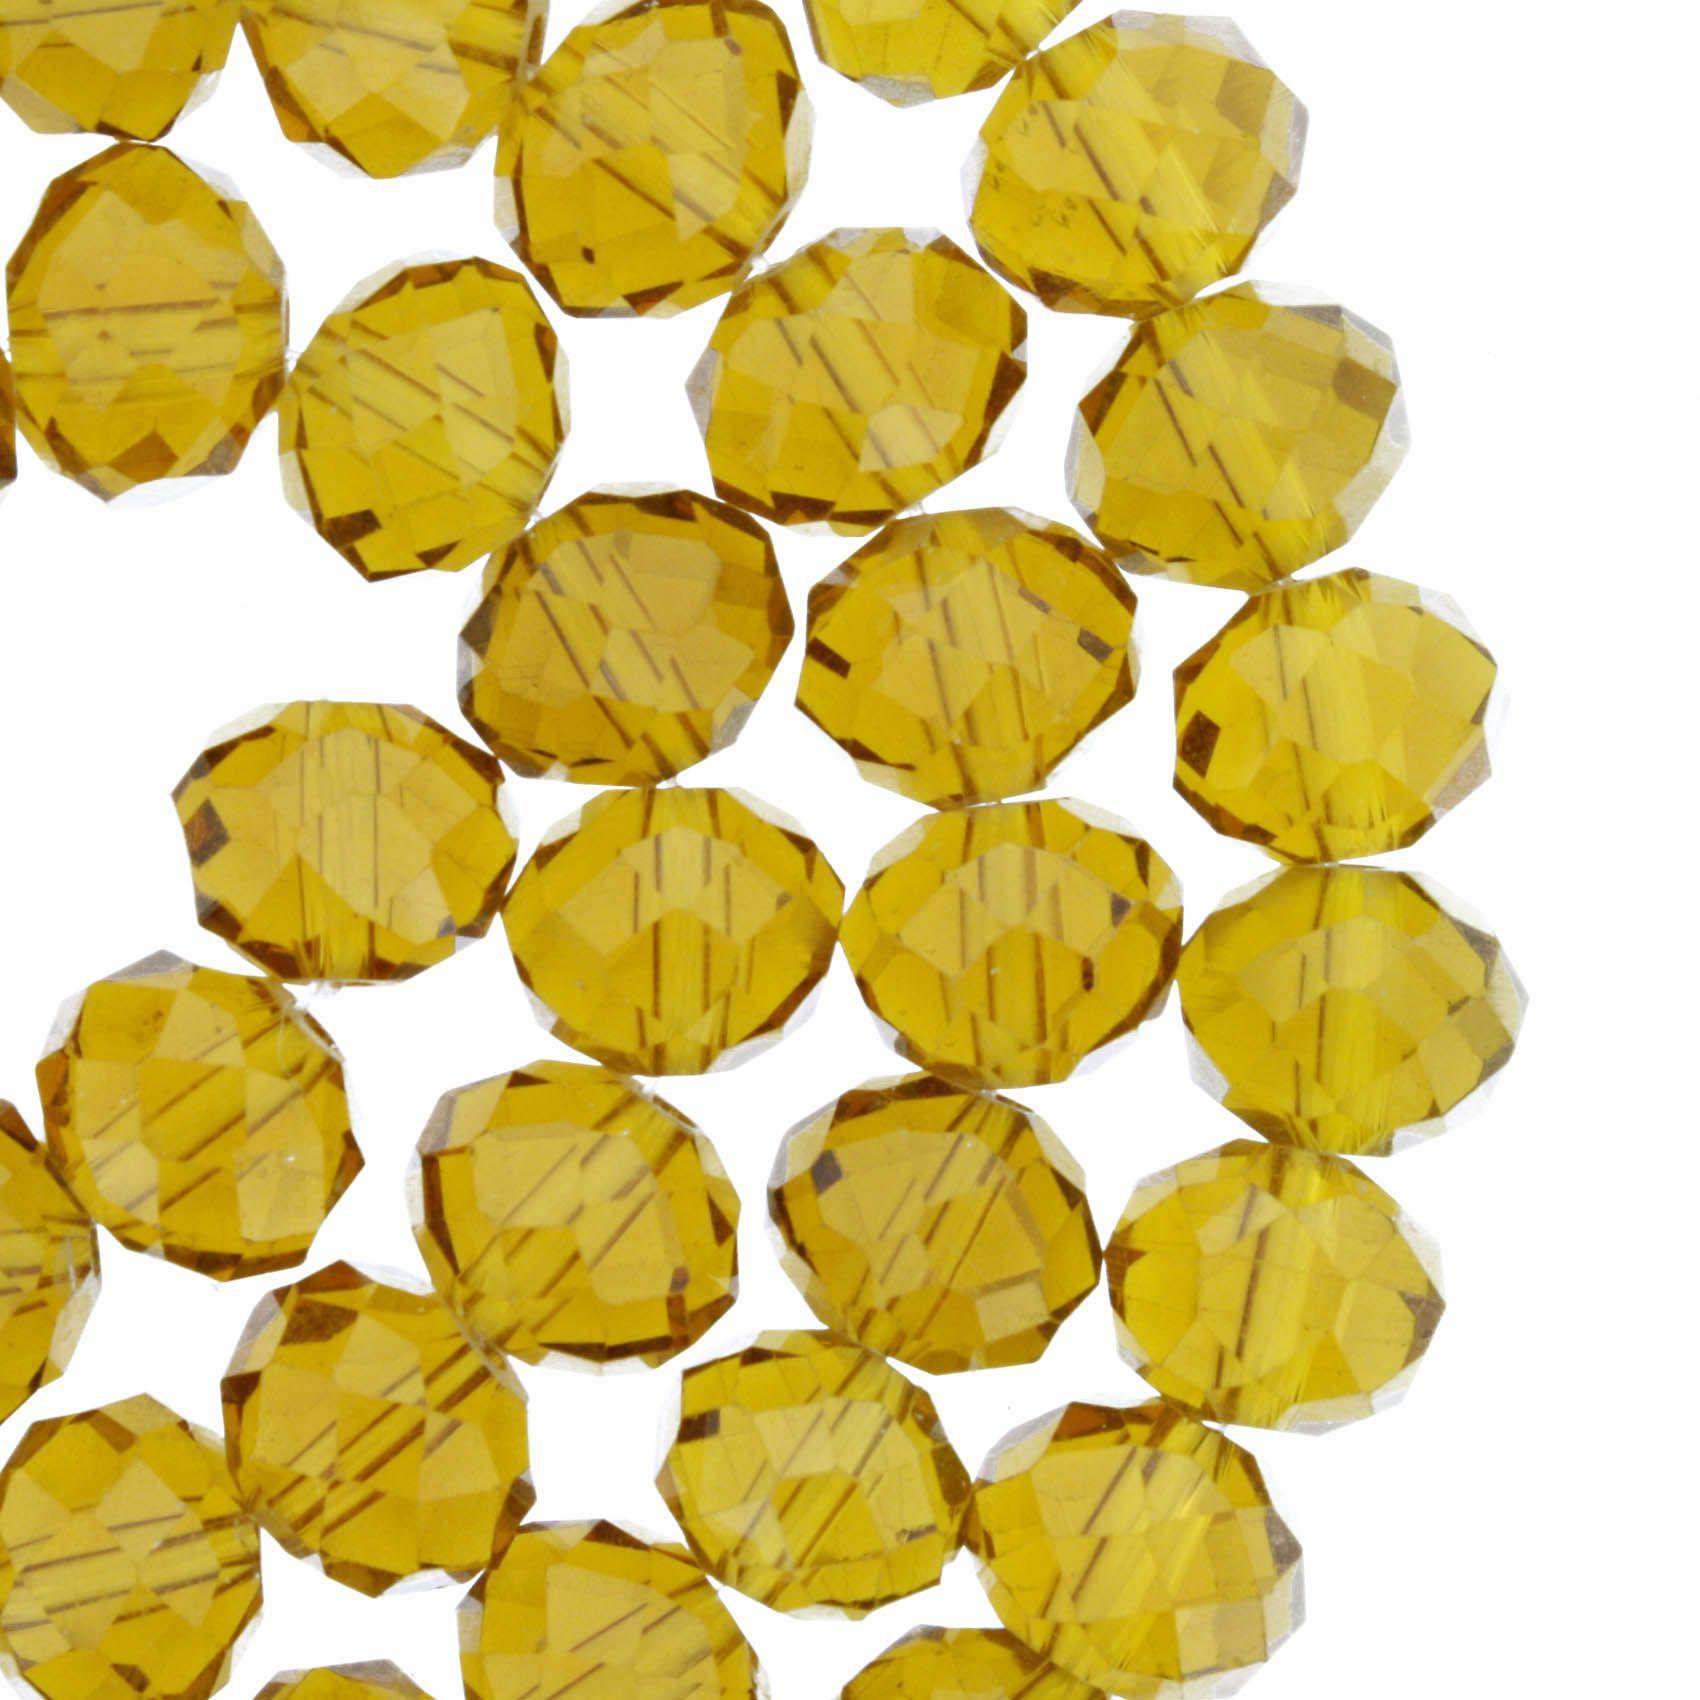 Fio de Cristal - Flat® - Âmbar - 10mm  - Stéphanie Bijoux® - Peças para Bijuterias e Artesanato